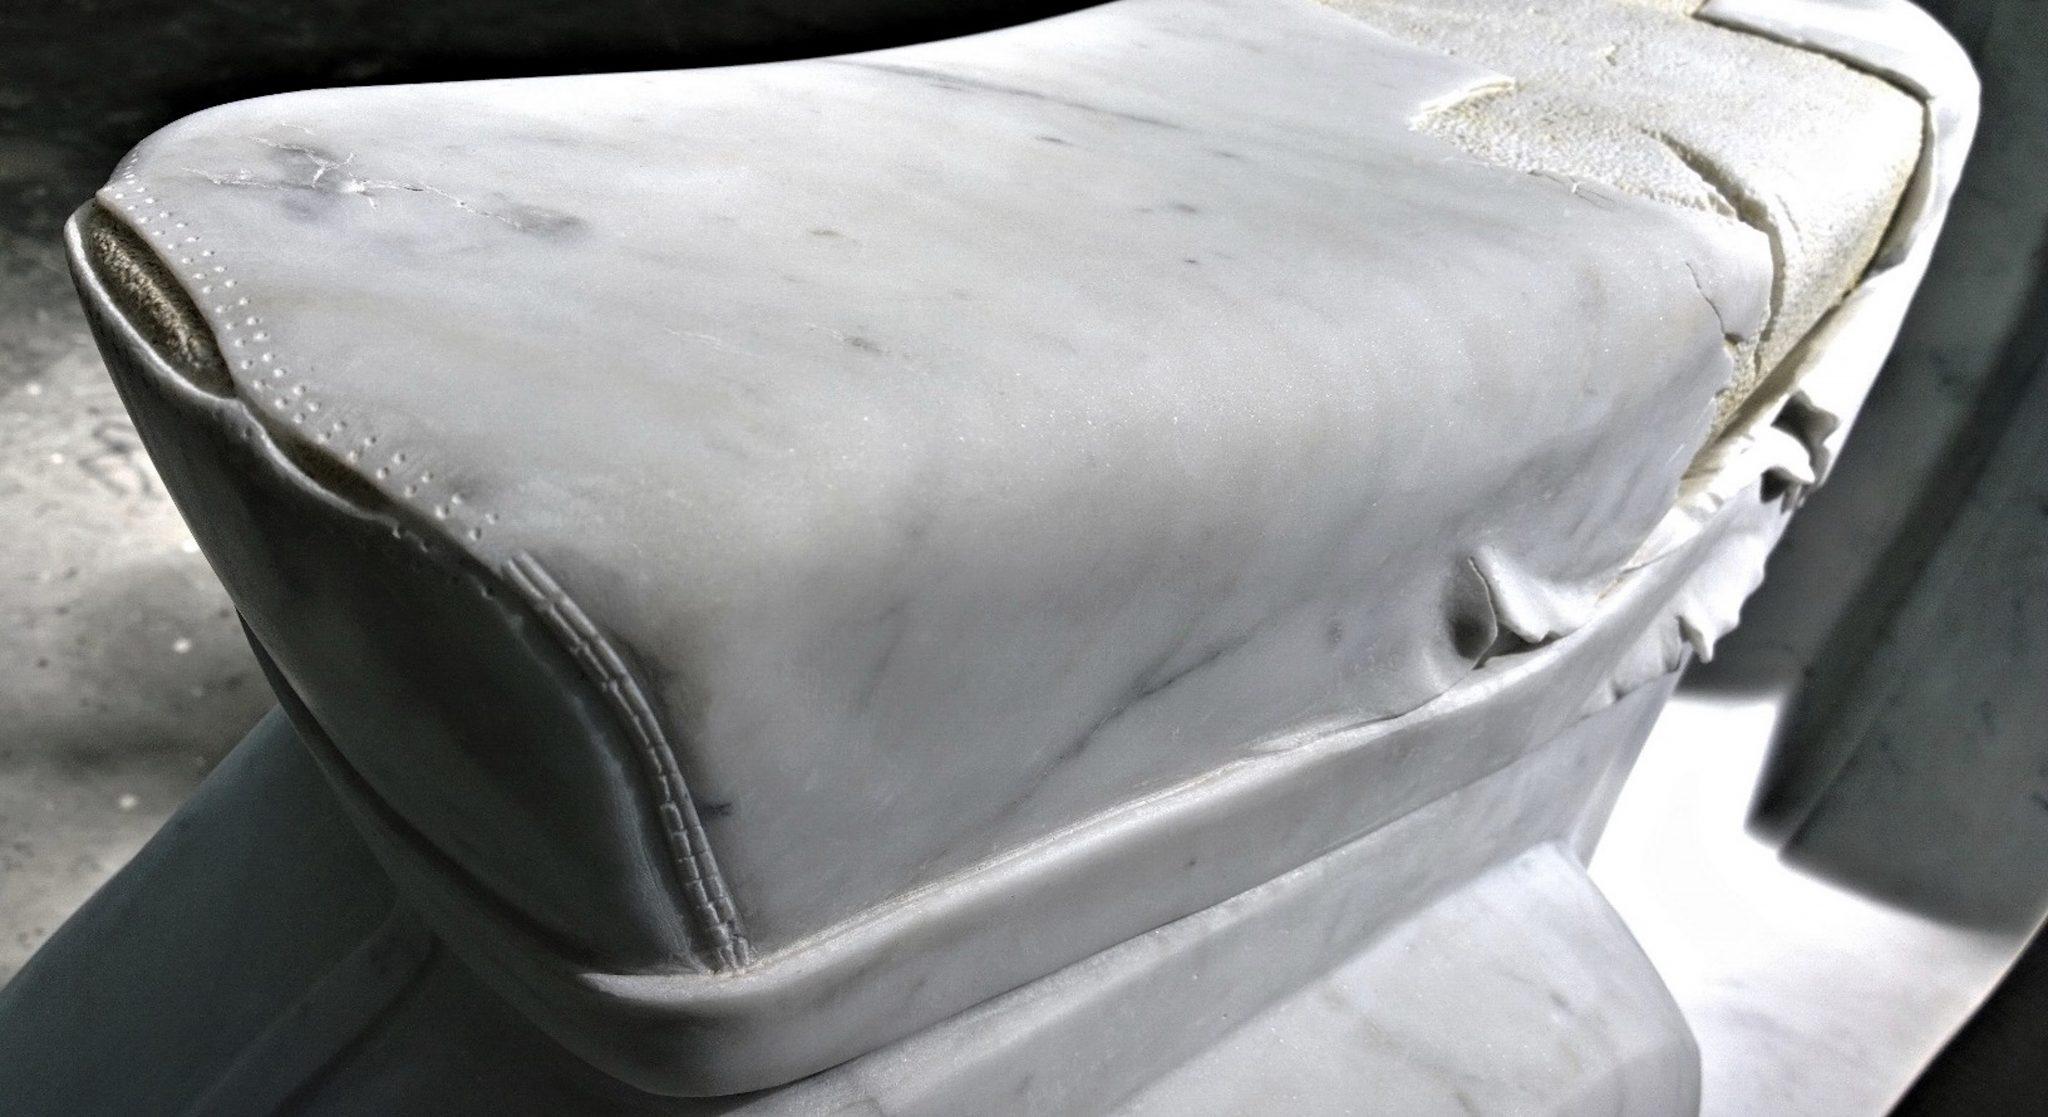 Nazareno Biondo Midsummer Night's Dream marmo bianco Carrara 160x70x50cm 2011 collab.Daniele Miola….. ..